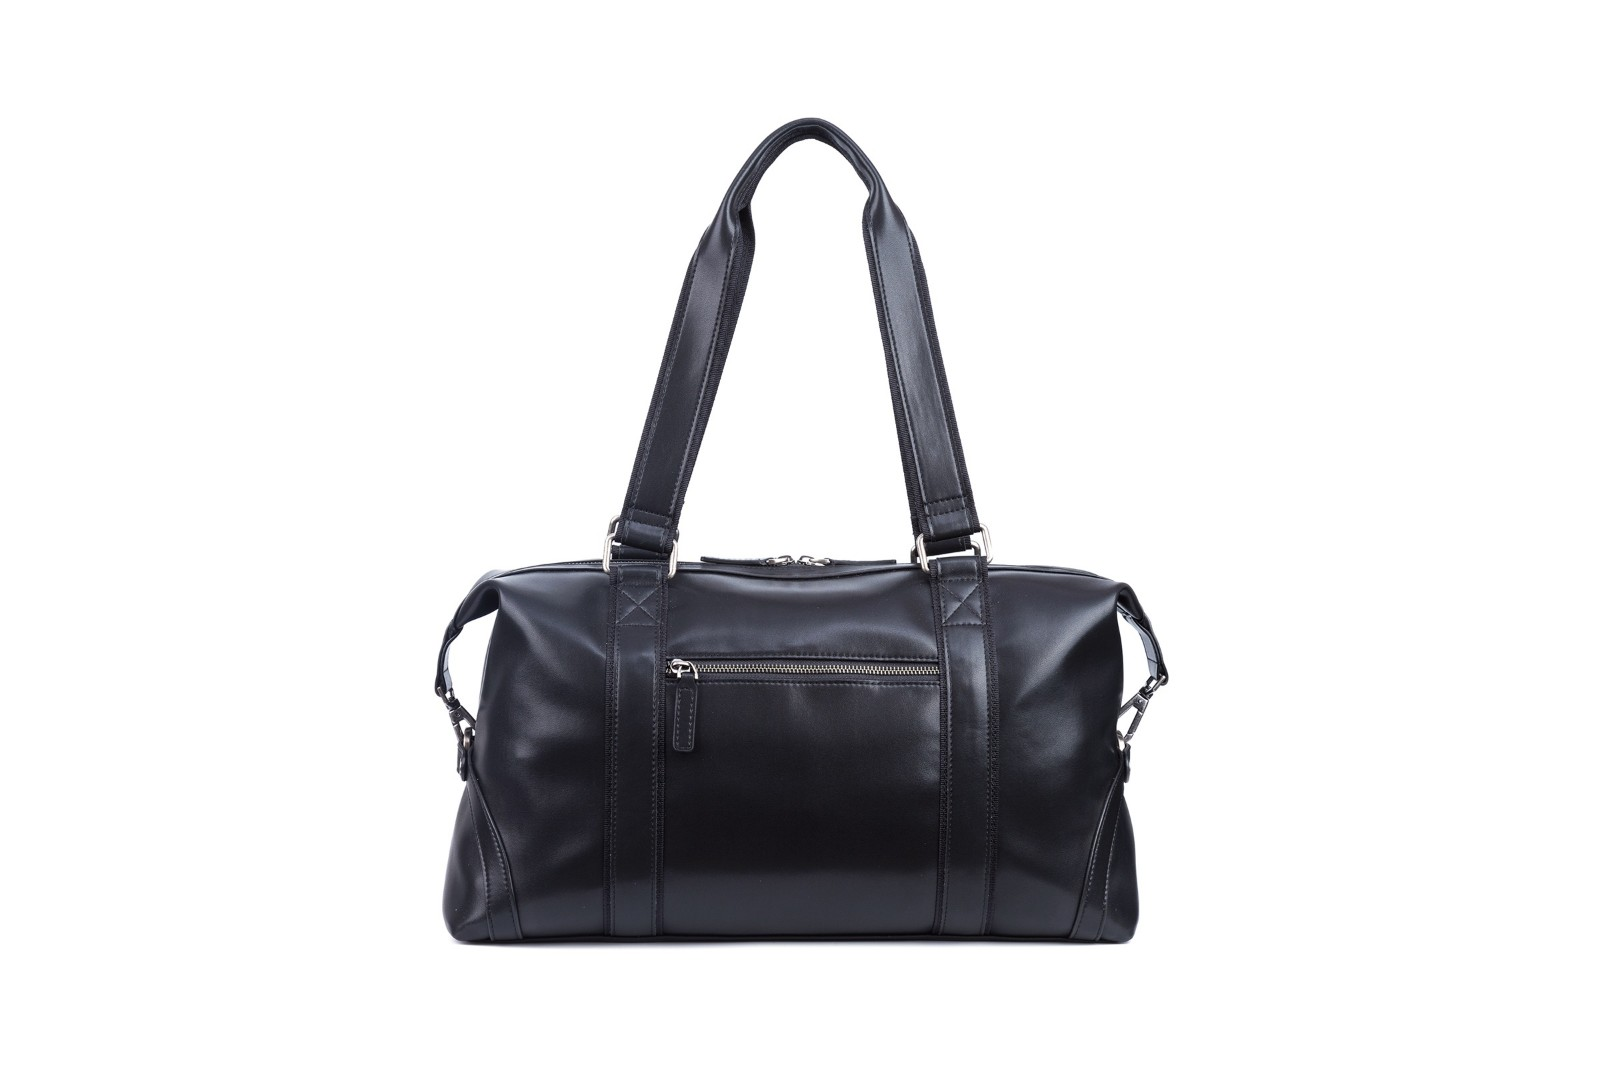 GF bags-Leather Duffle Bag Mens Duffle Leather Handle Metal Zipper Closure-1